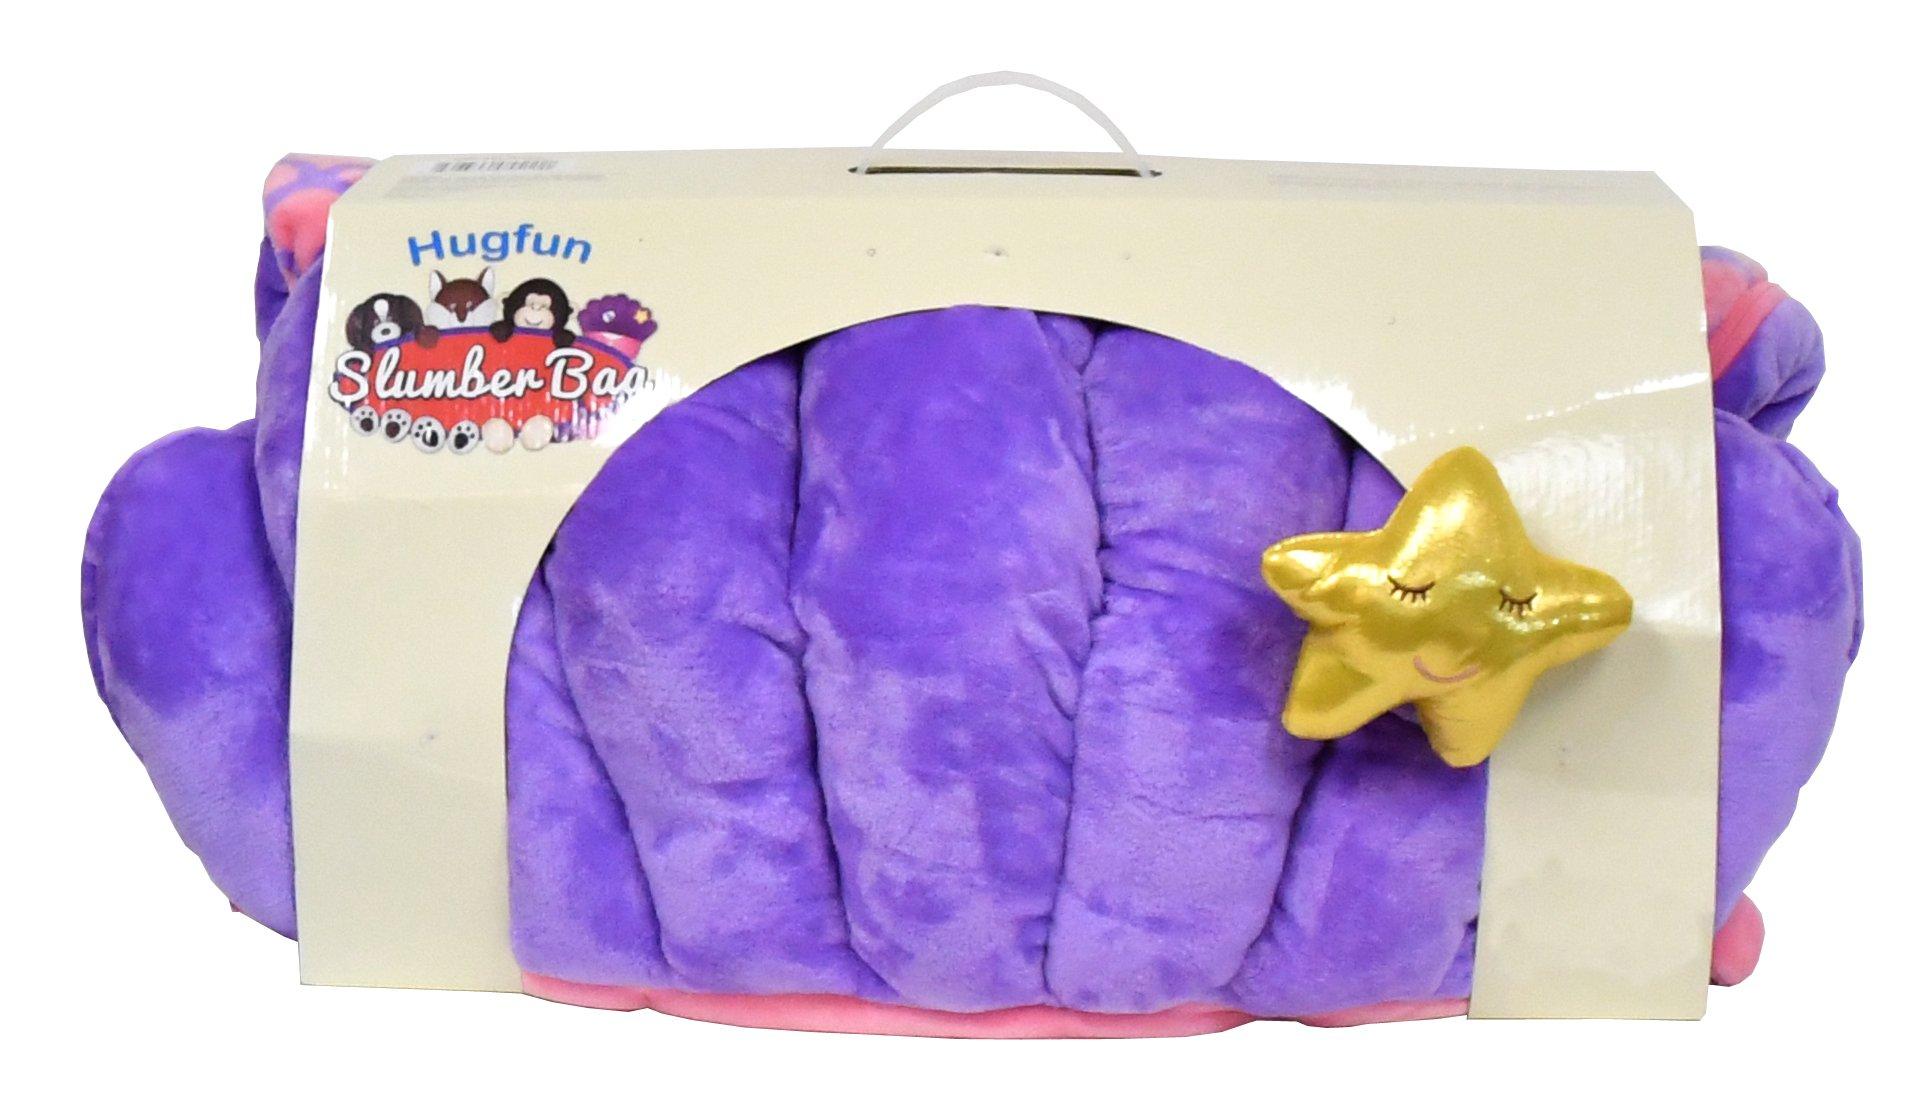 Hugfun Slumber Bag - Mermaid